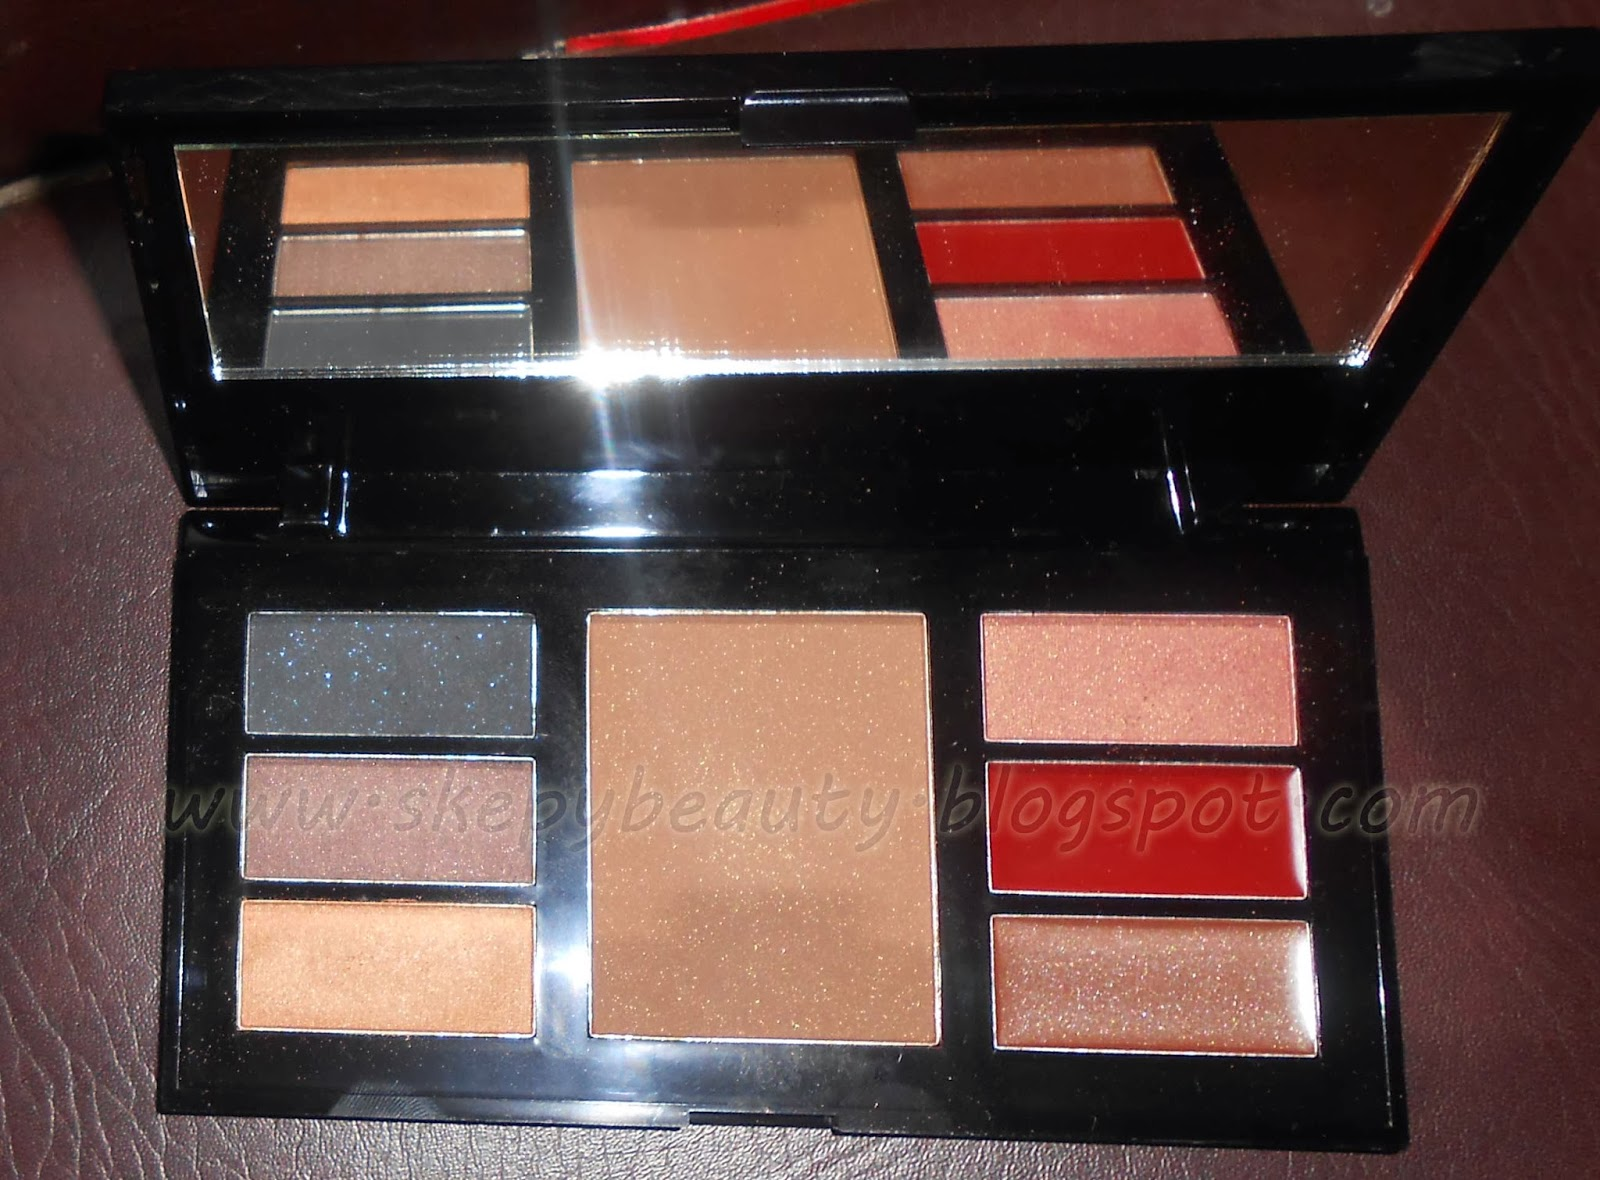 Skepy Beauty Place Review Sleek Flash A Pout Lipstick